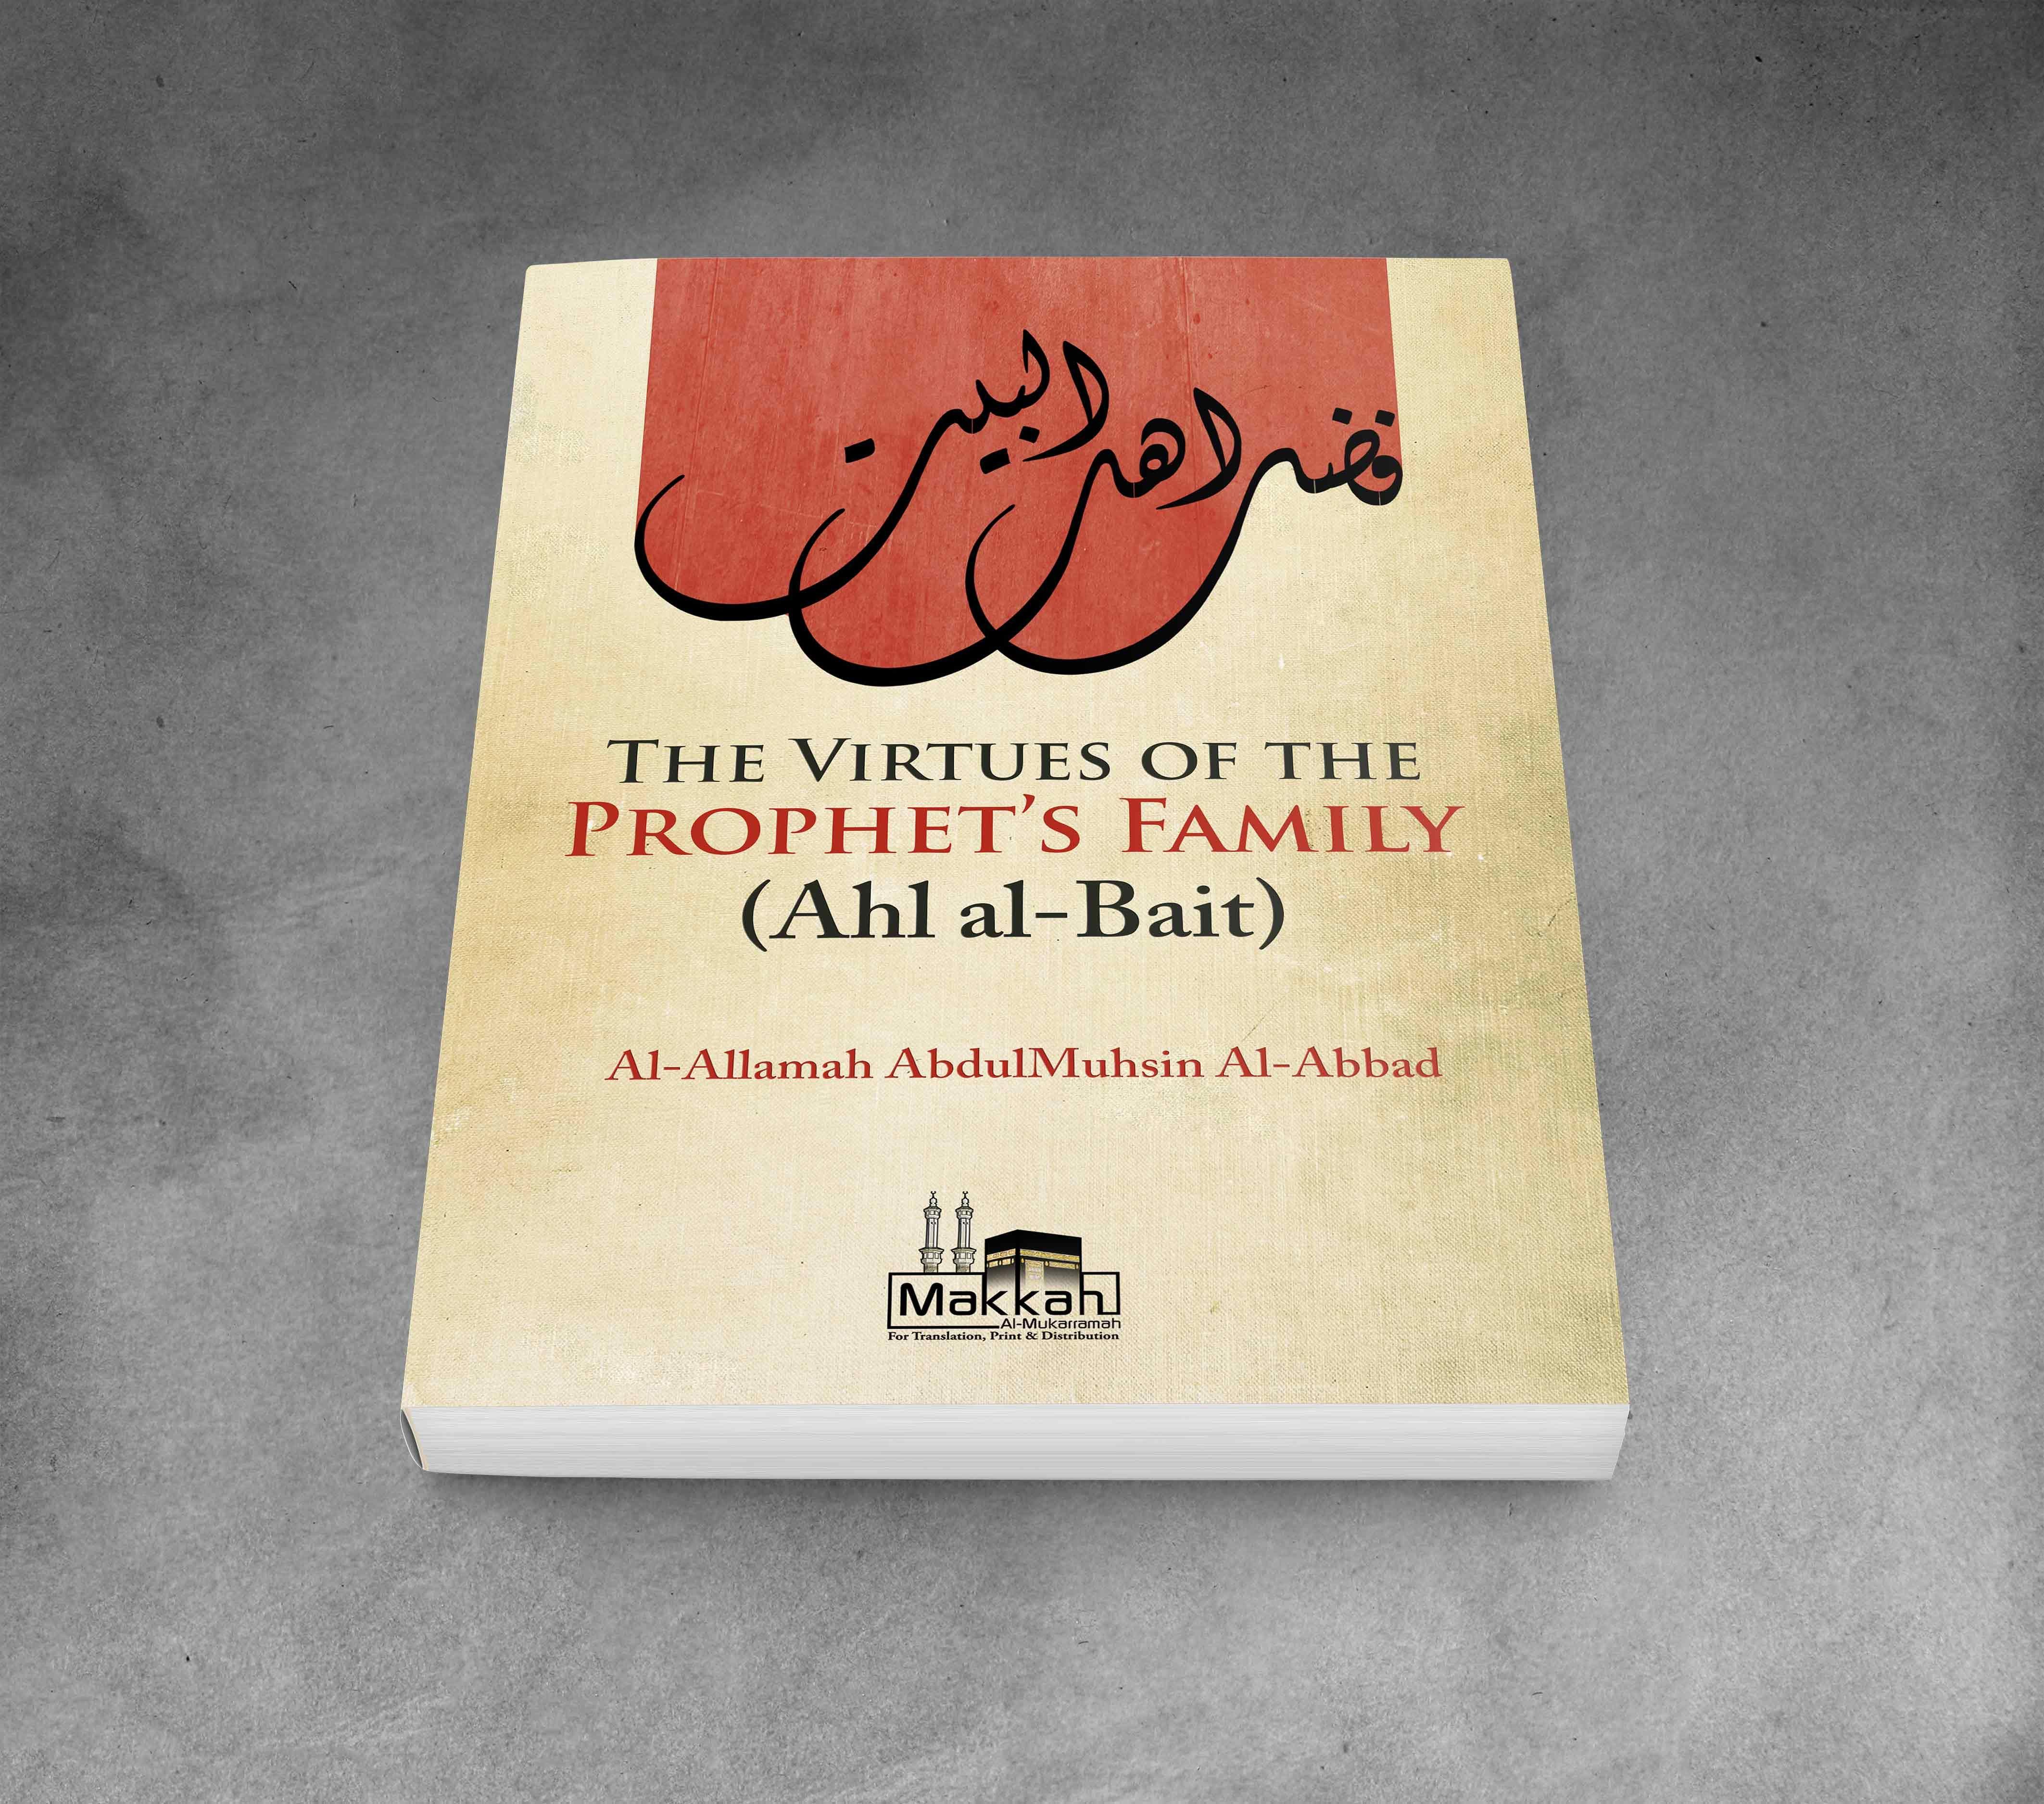 Shia books Islamic art calligraphy Islamic calligraphy